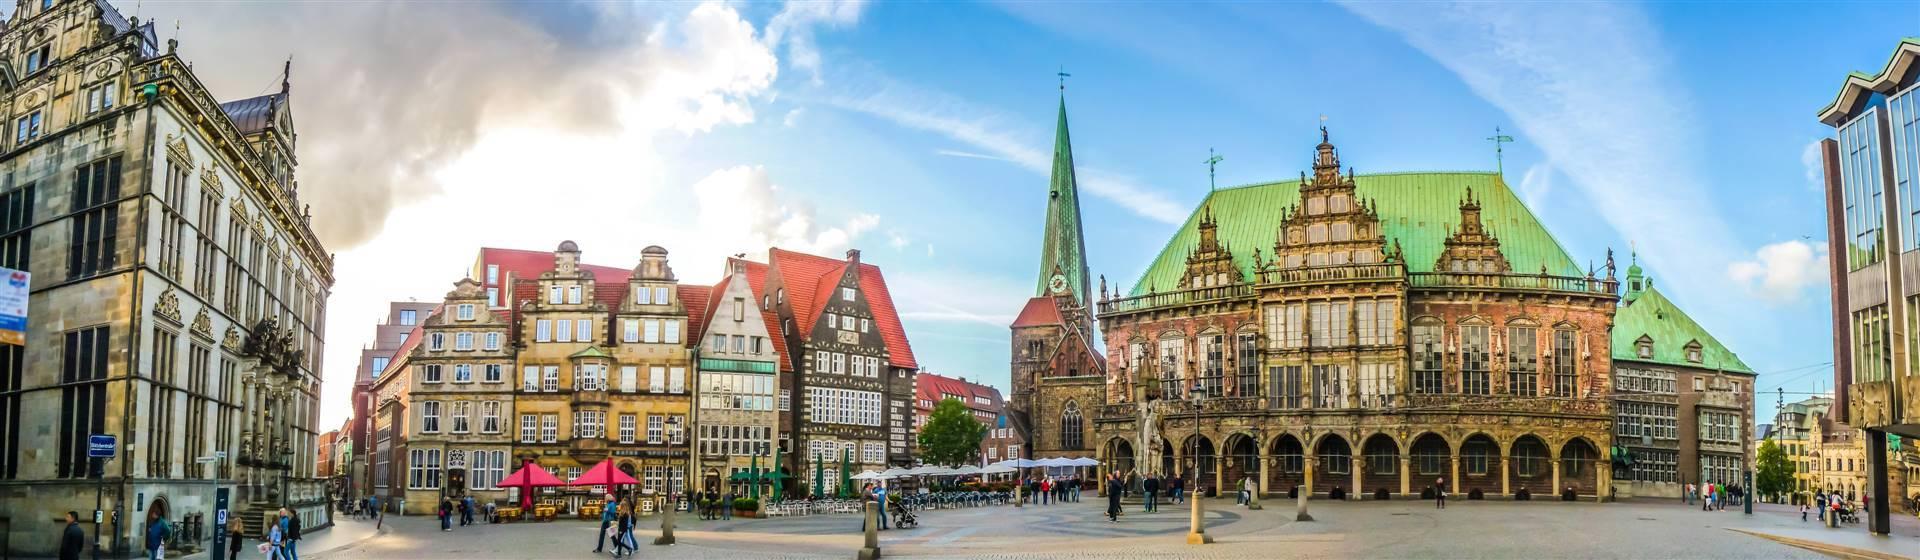 "<img src=""ghanh2021-shutterstock_309152135.jpeg"" alt=""Bremen""/>"